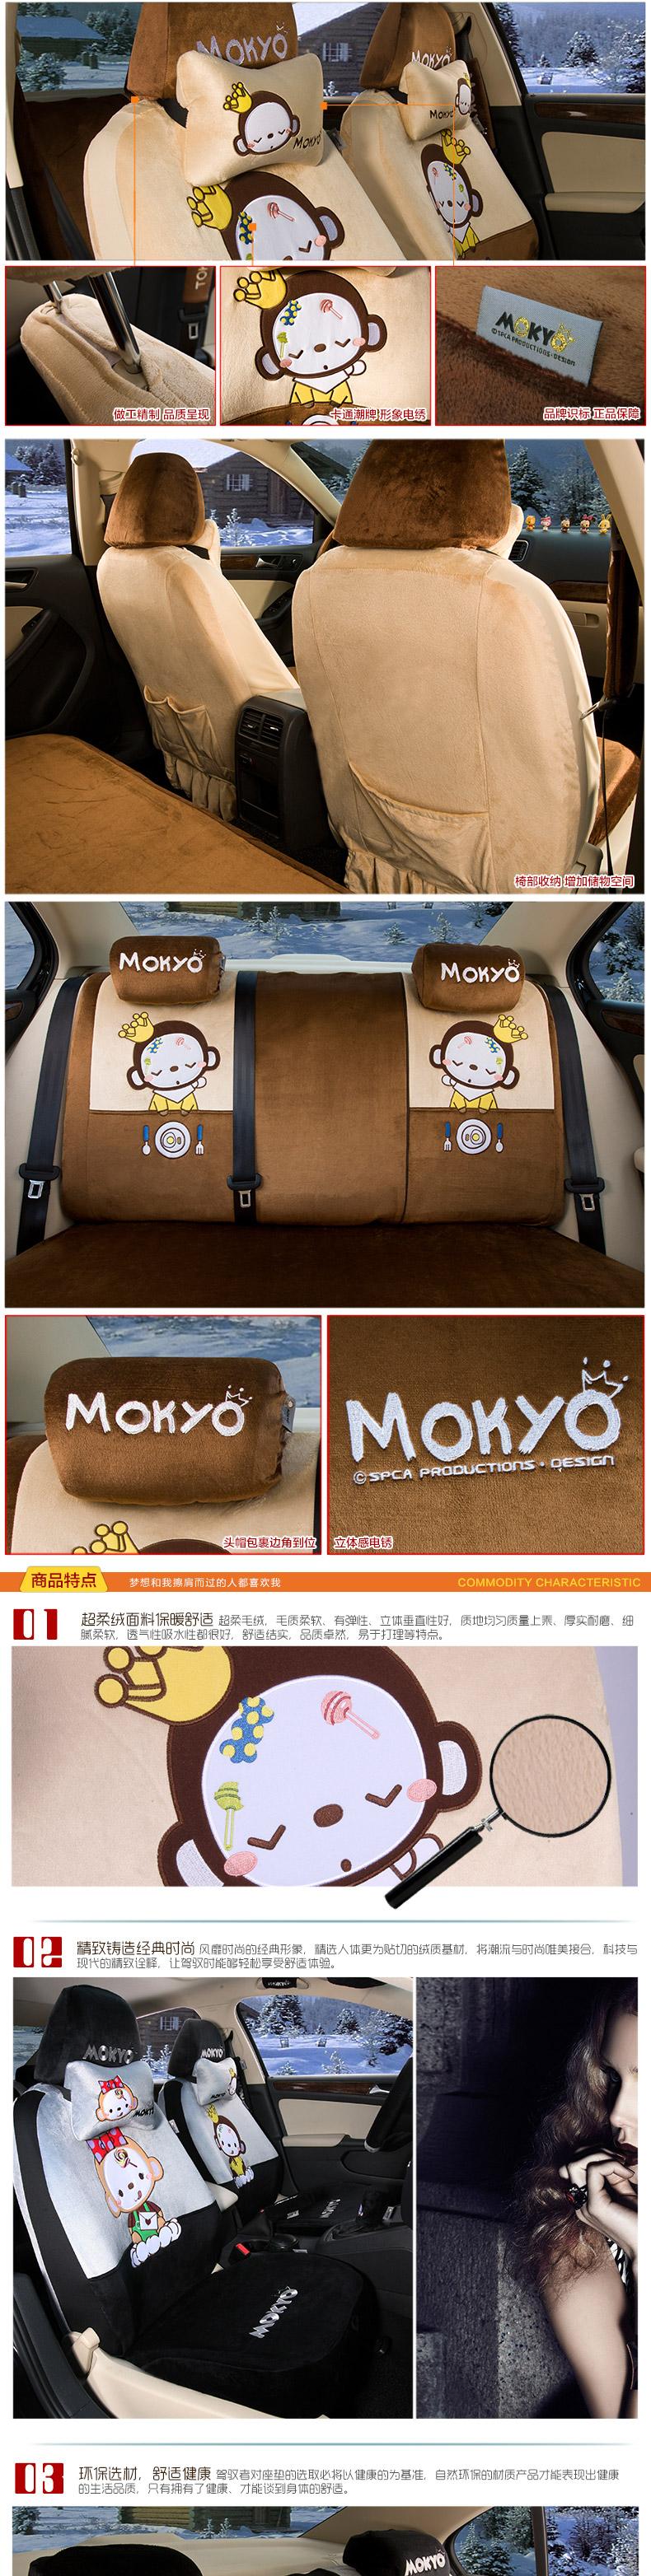 mokyo 皇冠猴 mk-302 超柔绒糖果系列20件套 四季通用